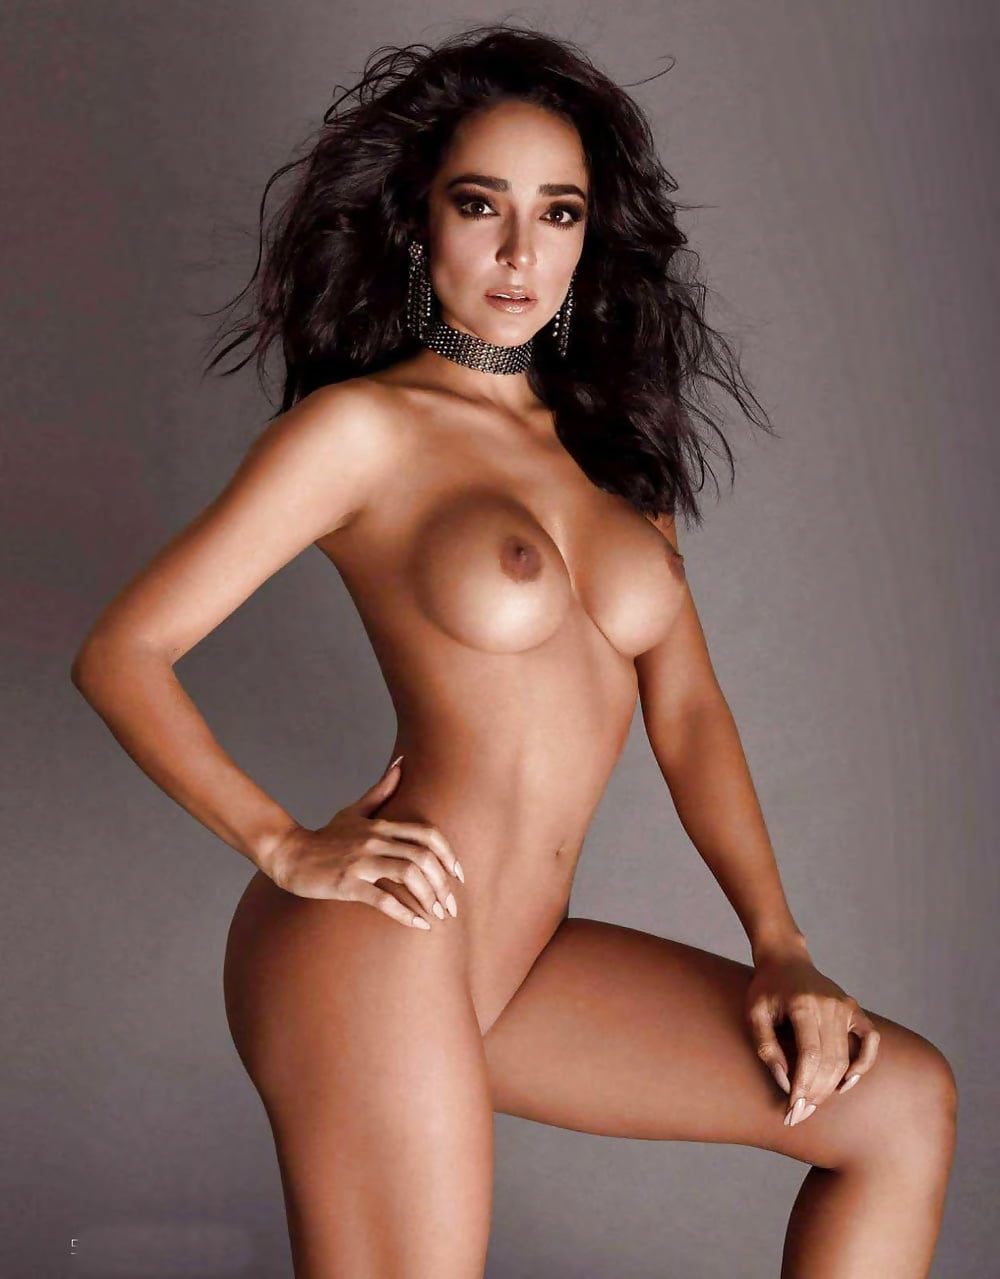 Latina celebs nude pics free